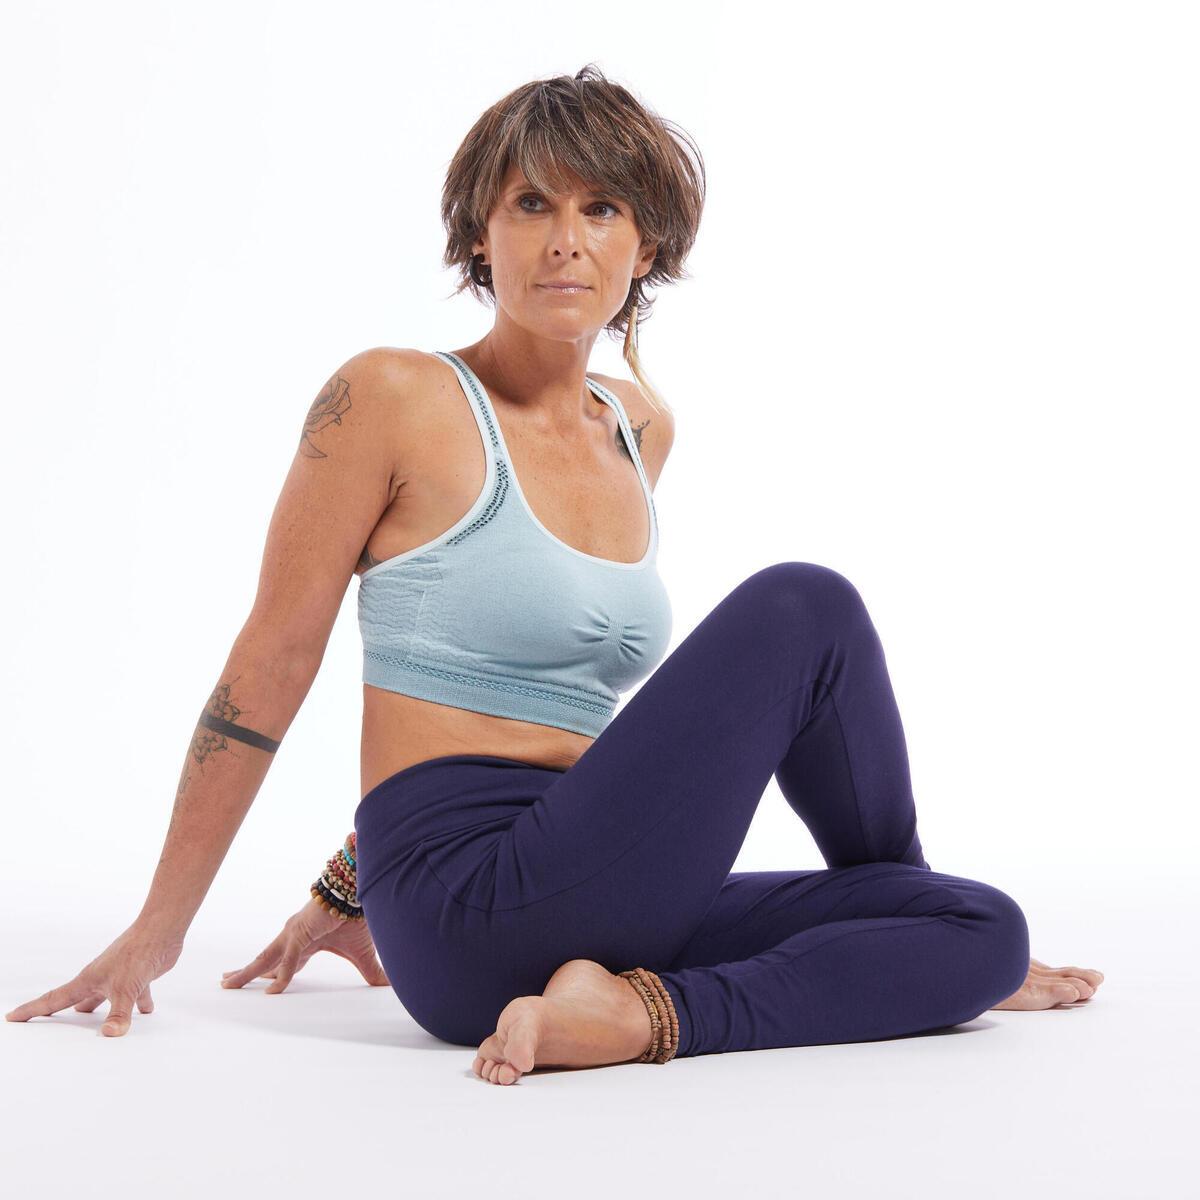 Bild 2 von Leggings sanftes Yoga aus Biobaumwolle Damen marineblau